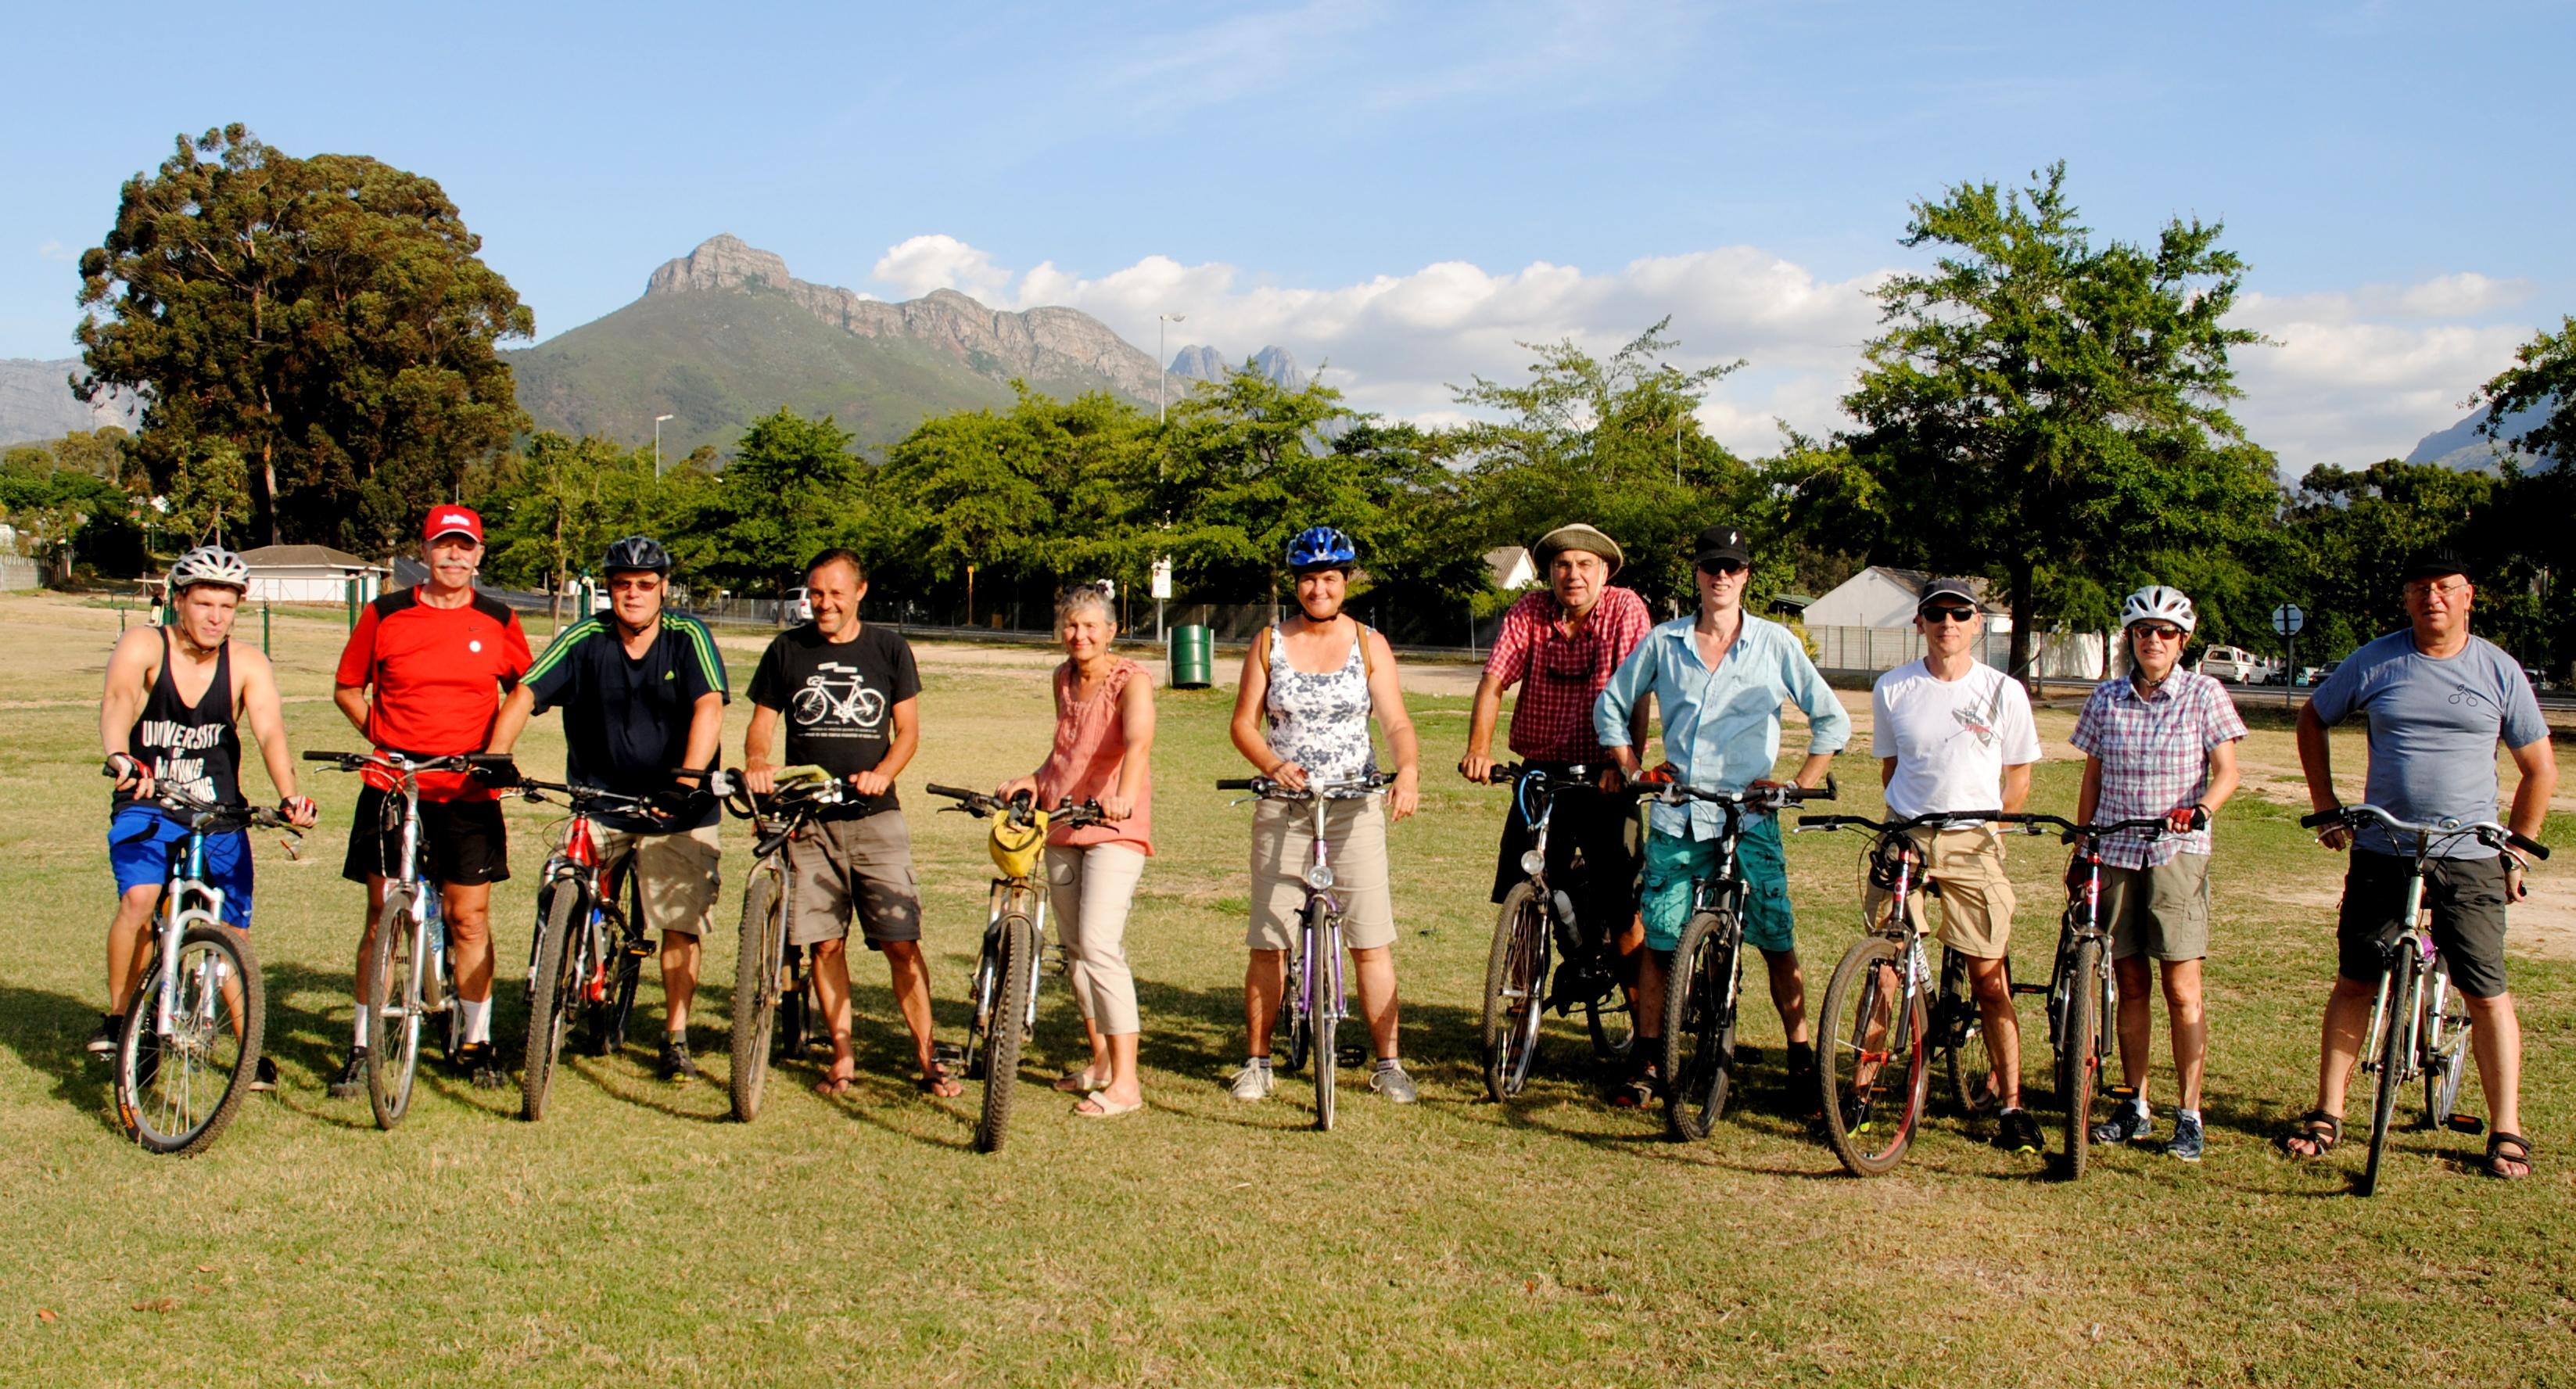 Cycling is getting a better deal in Stellenbosch